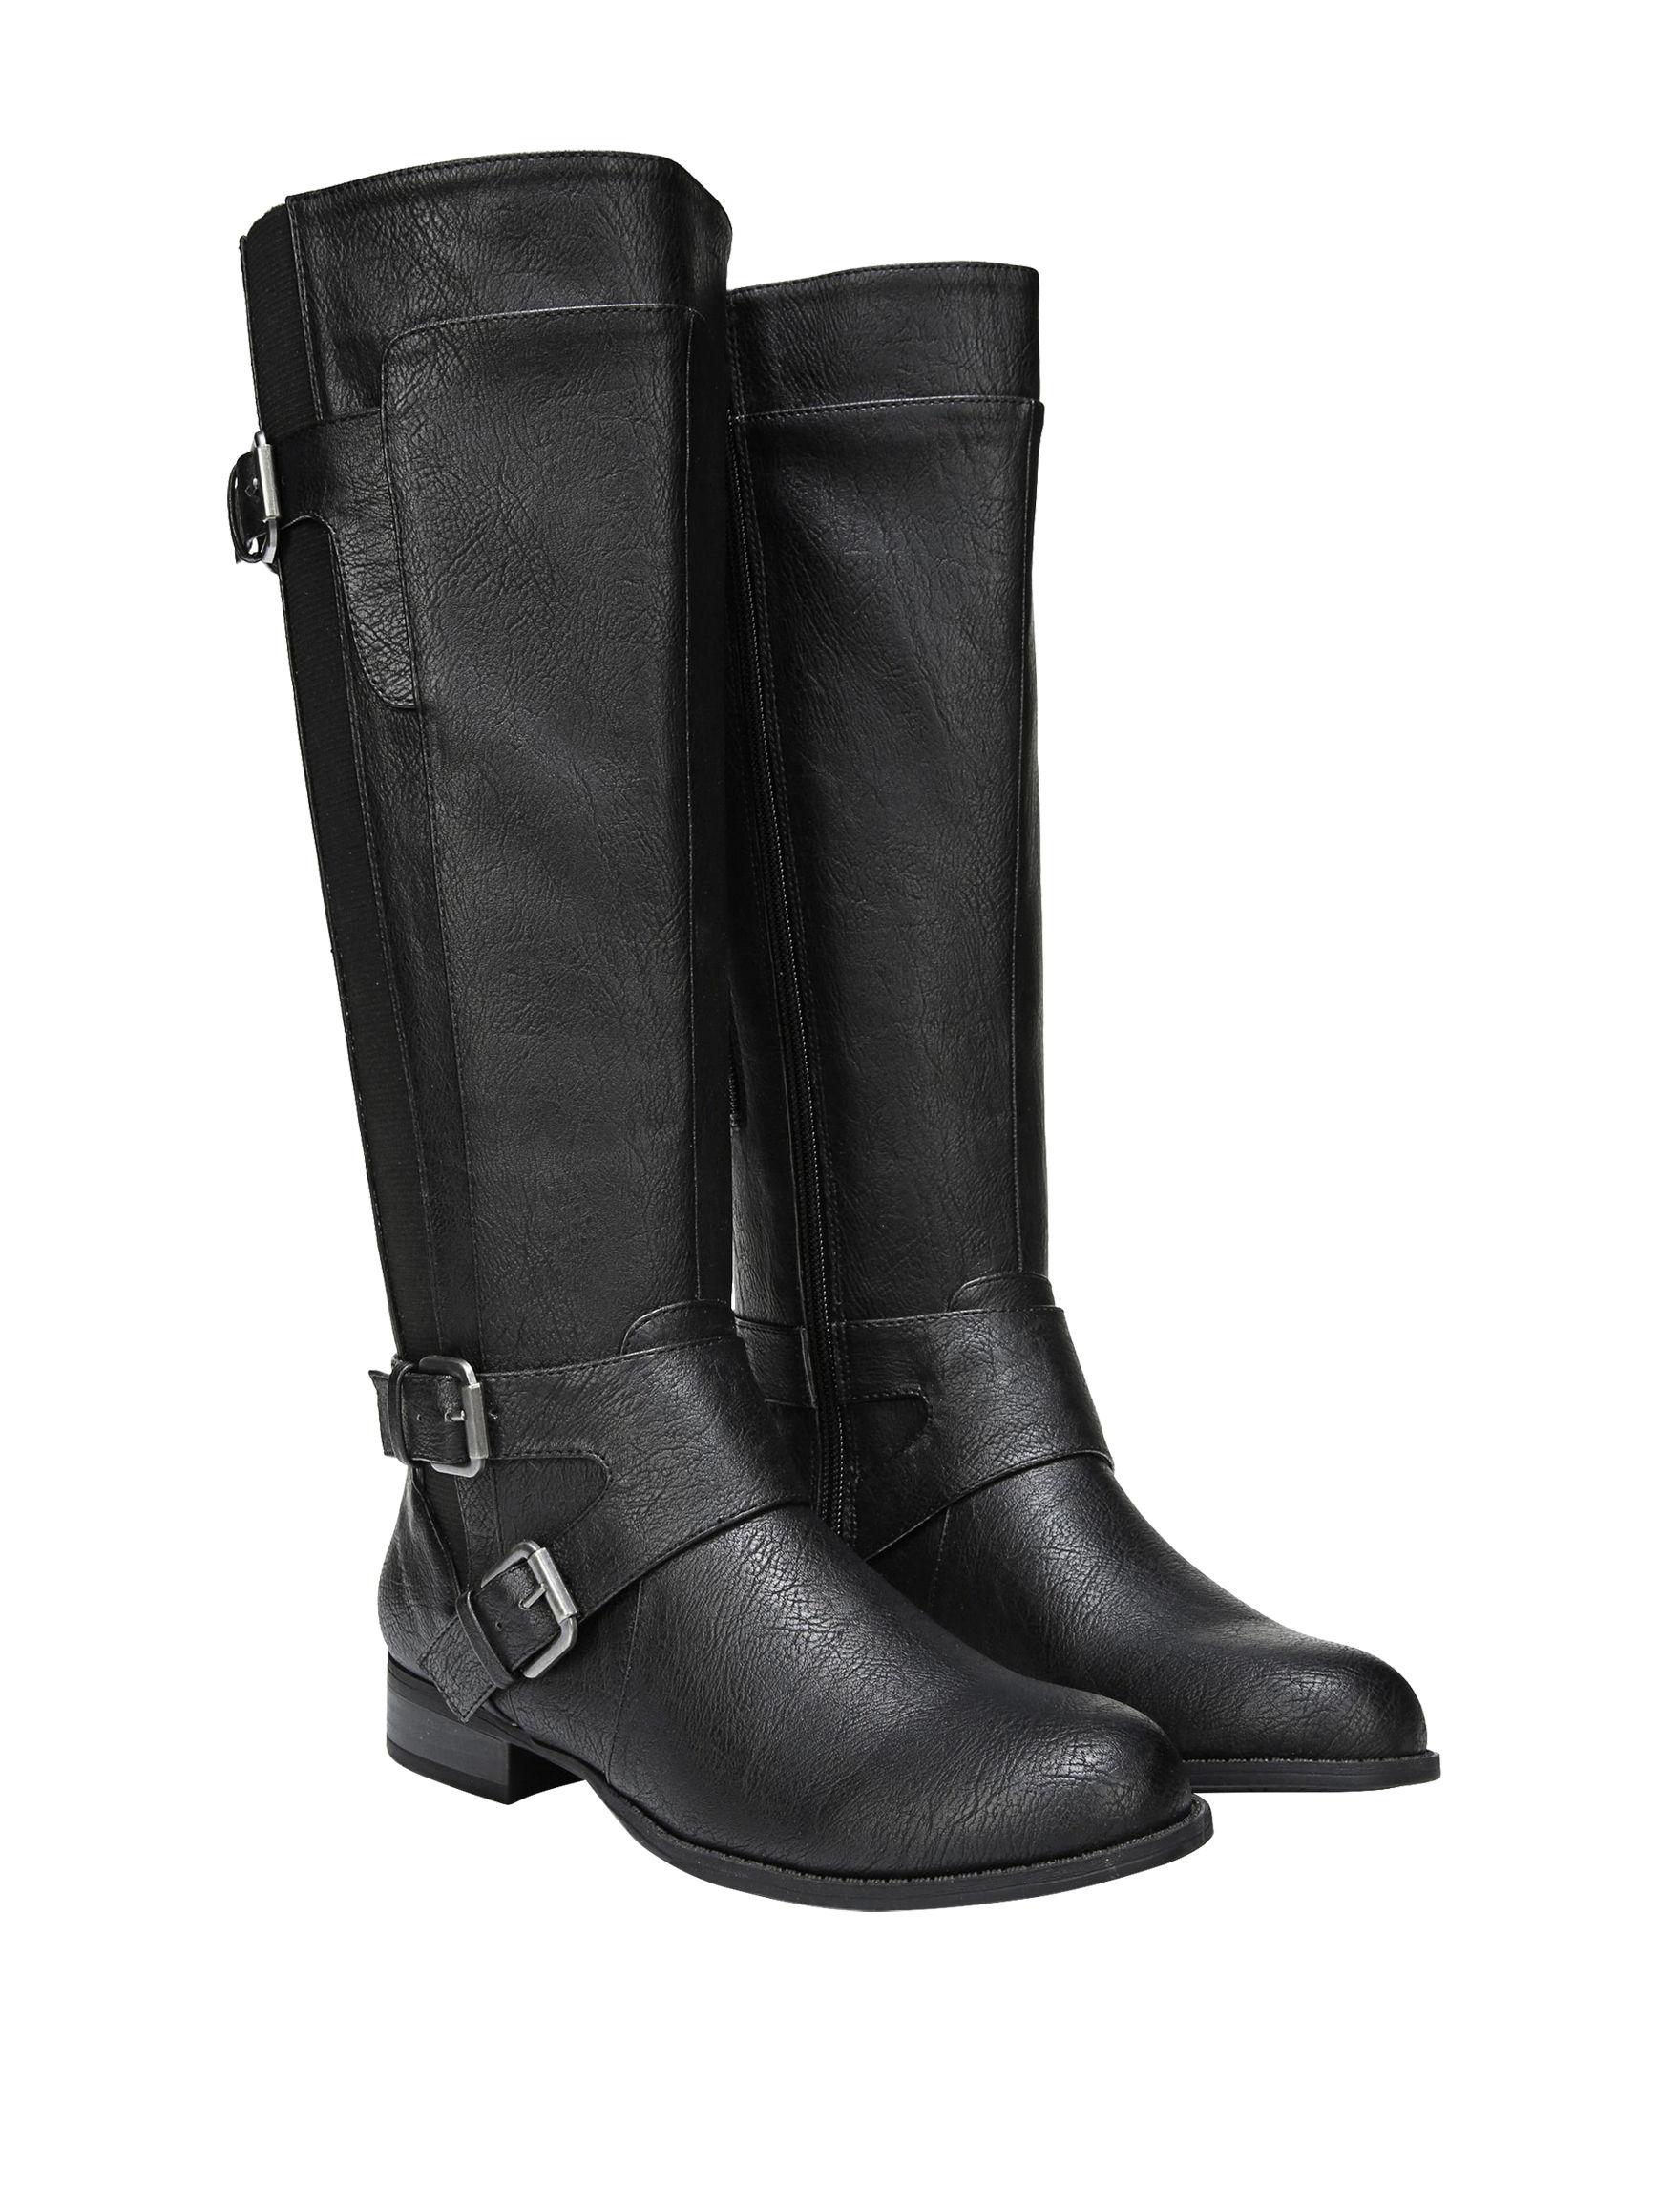 Lifestride Black Riding Boots Wide Calf